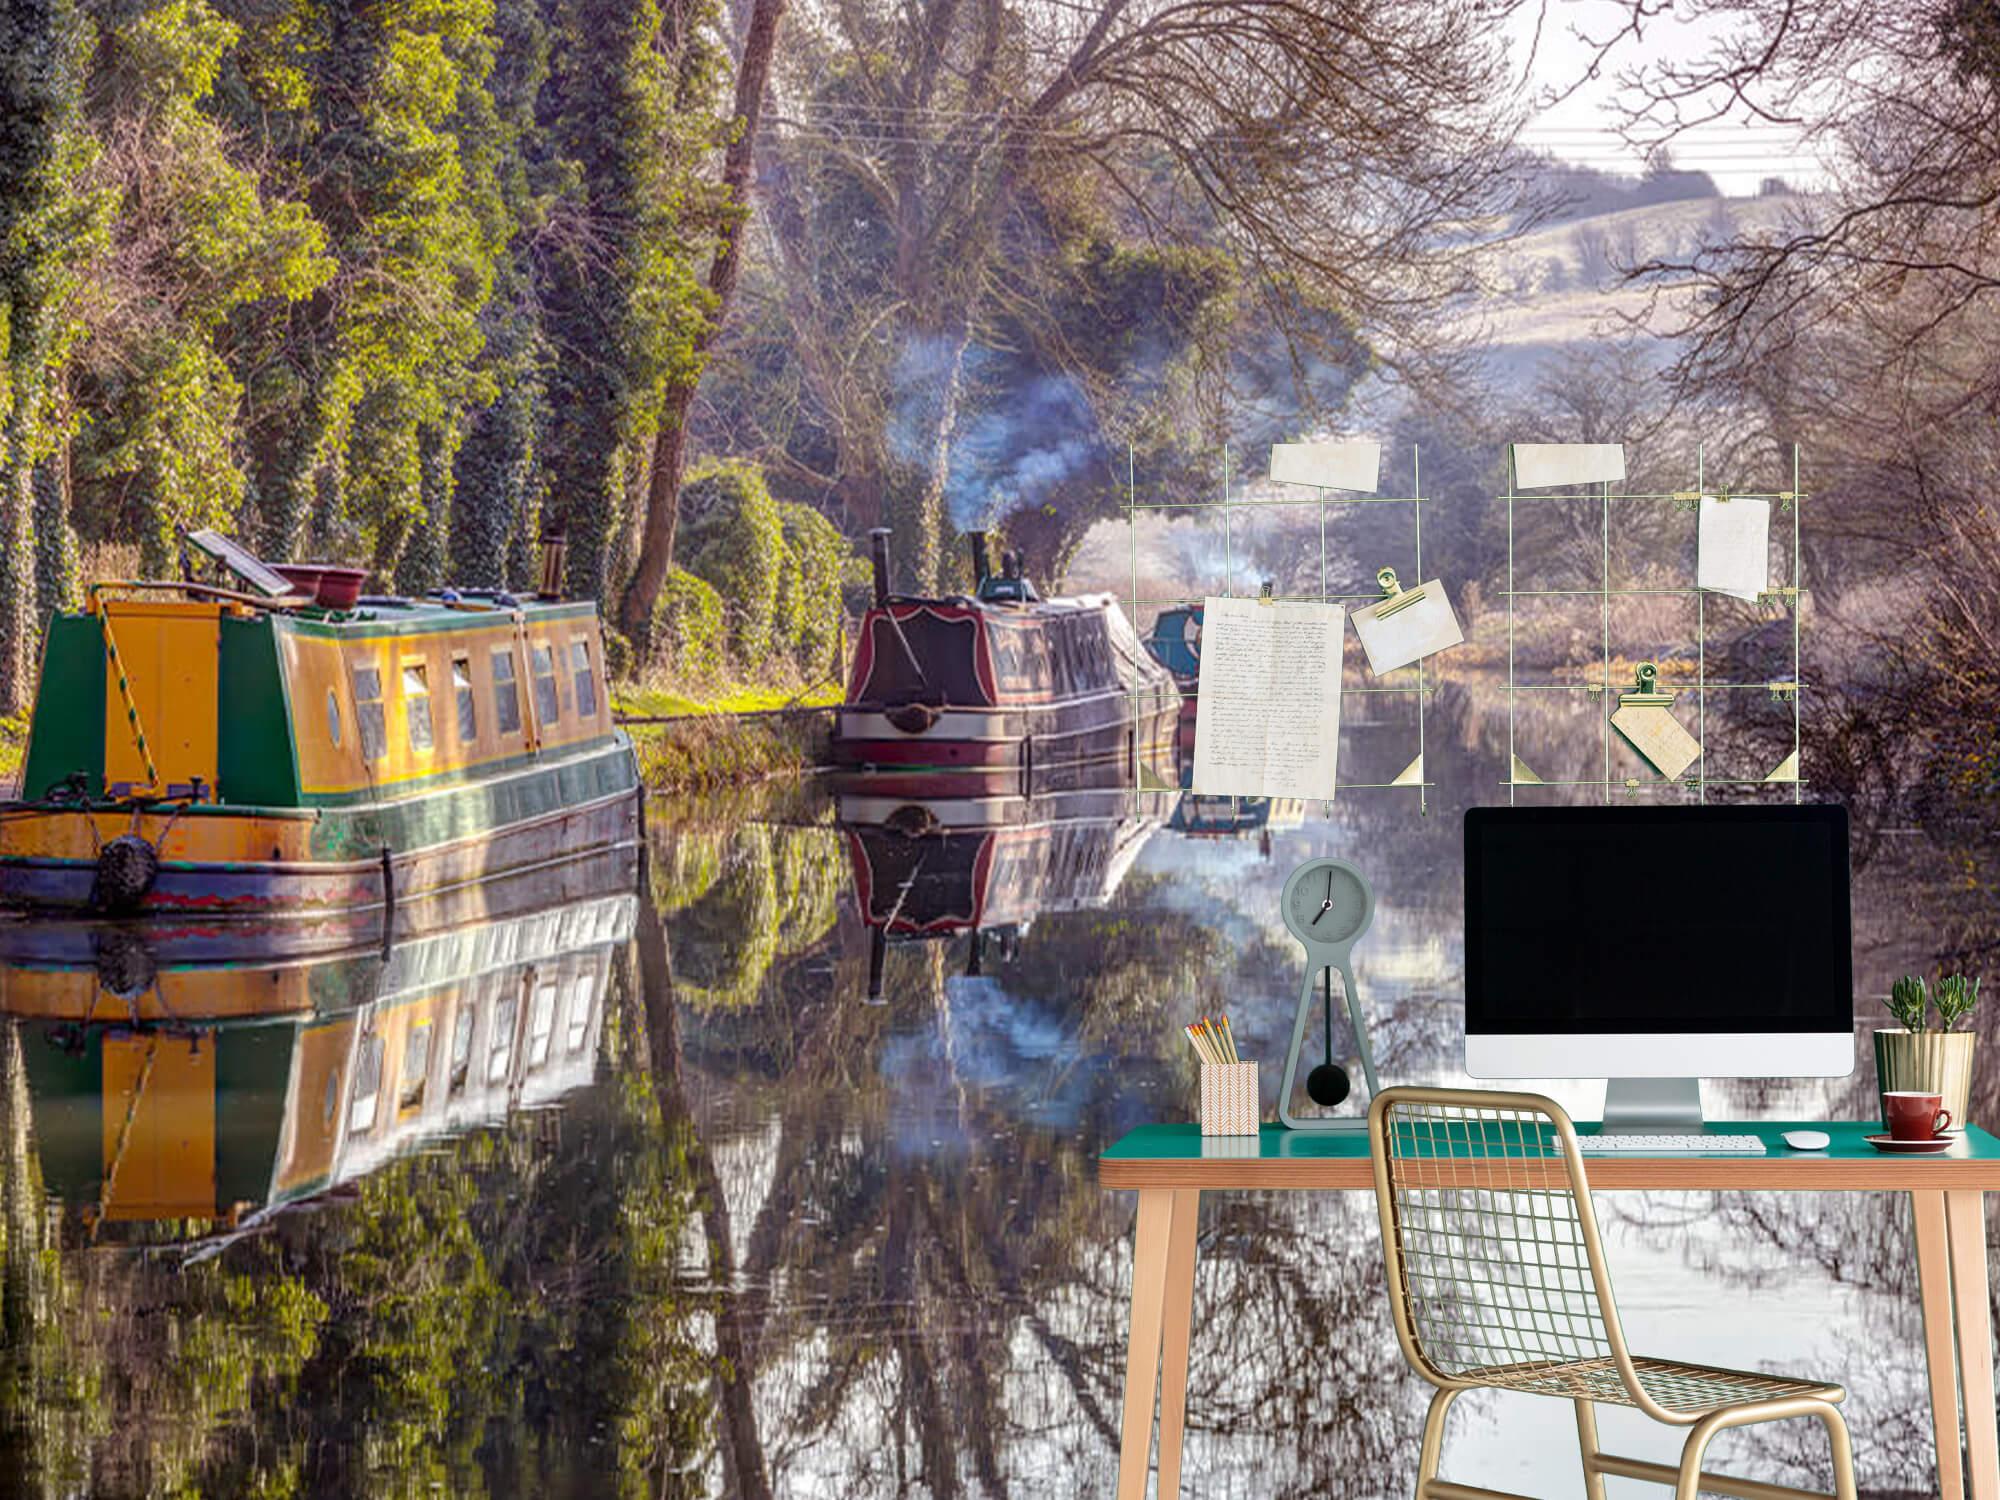 Canal in Kintbury 5